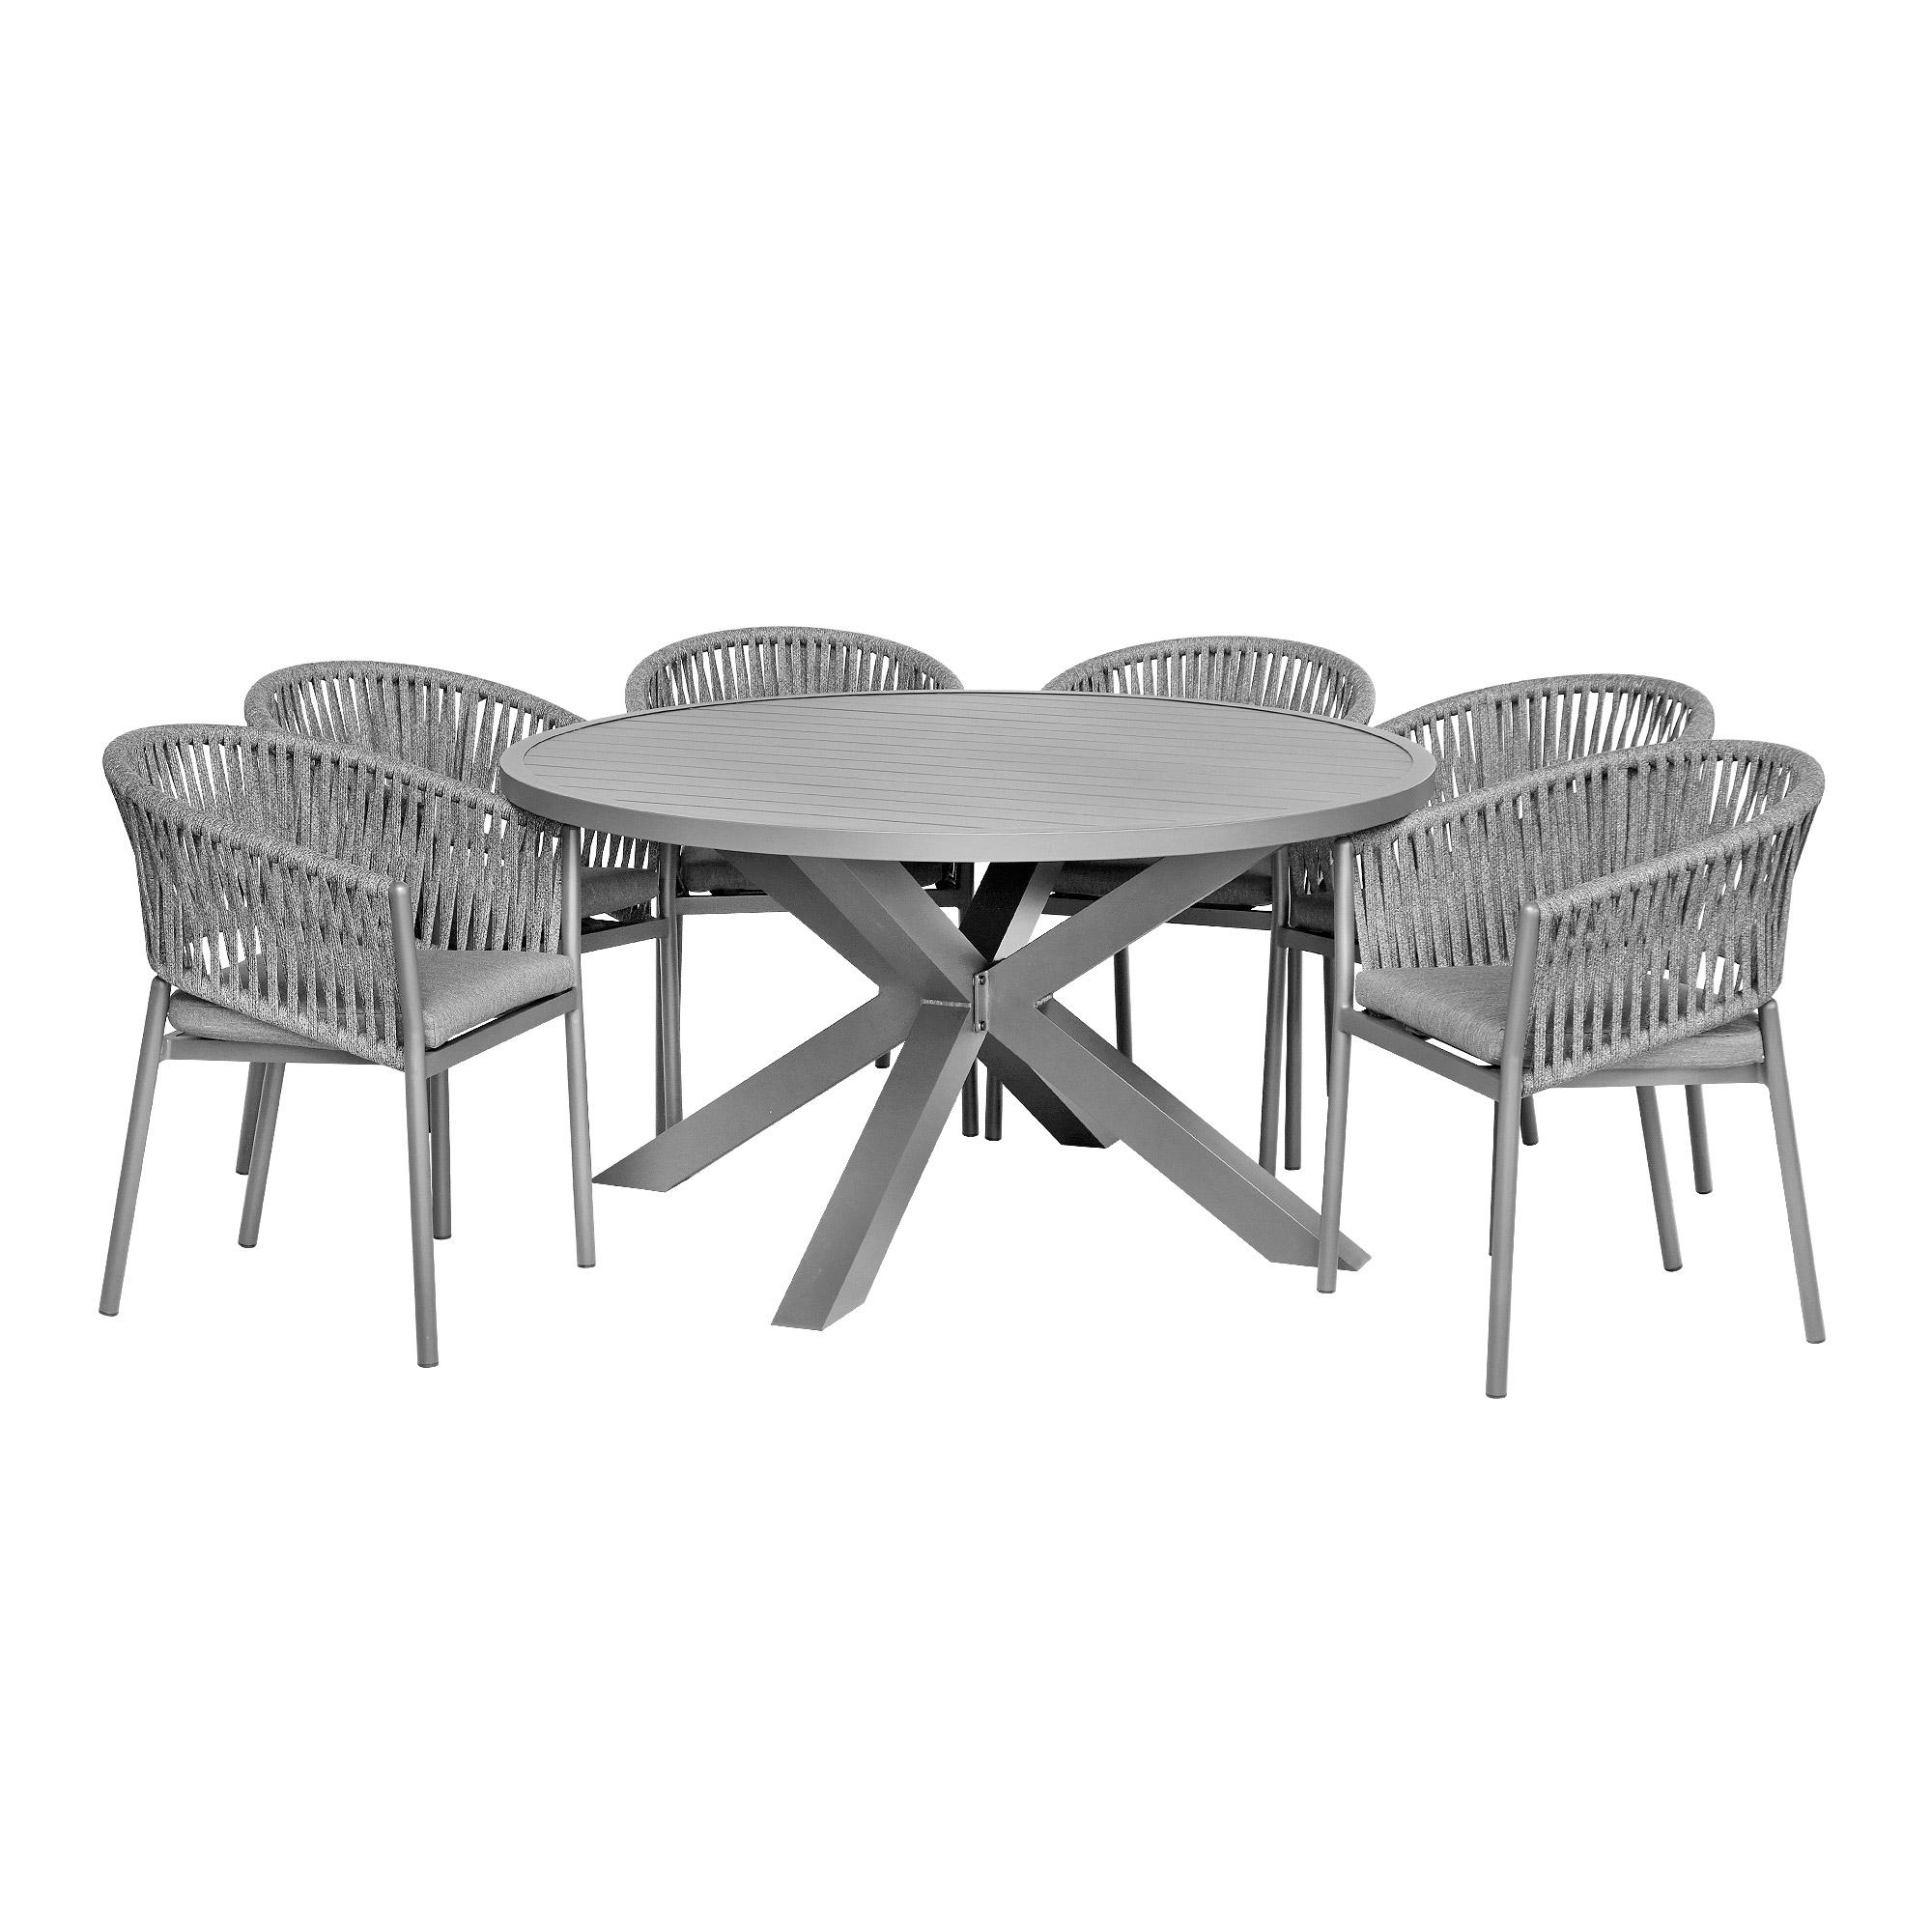 Комплект мебели Bizzotto Florencia: стол skipper + 6 кресел